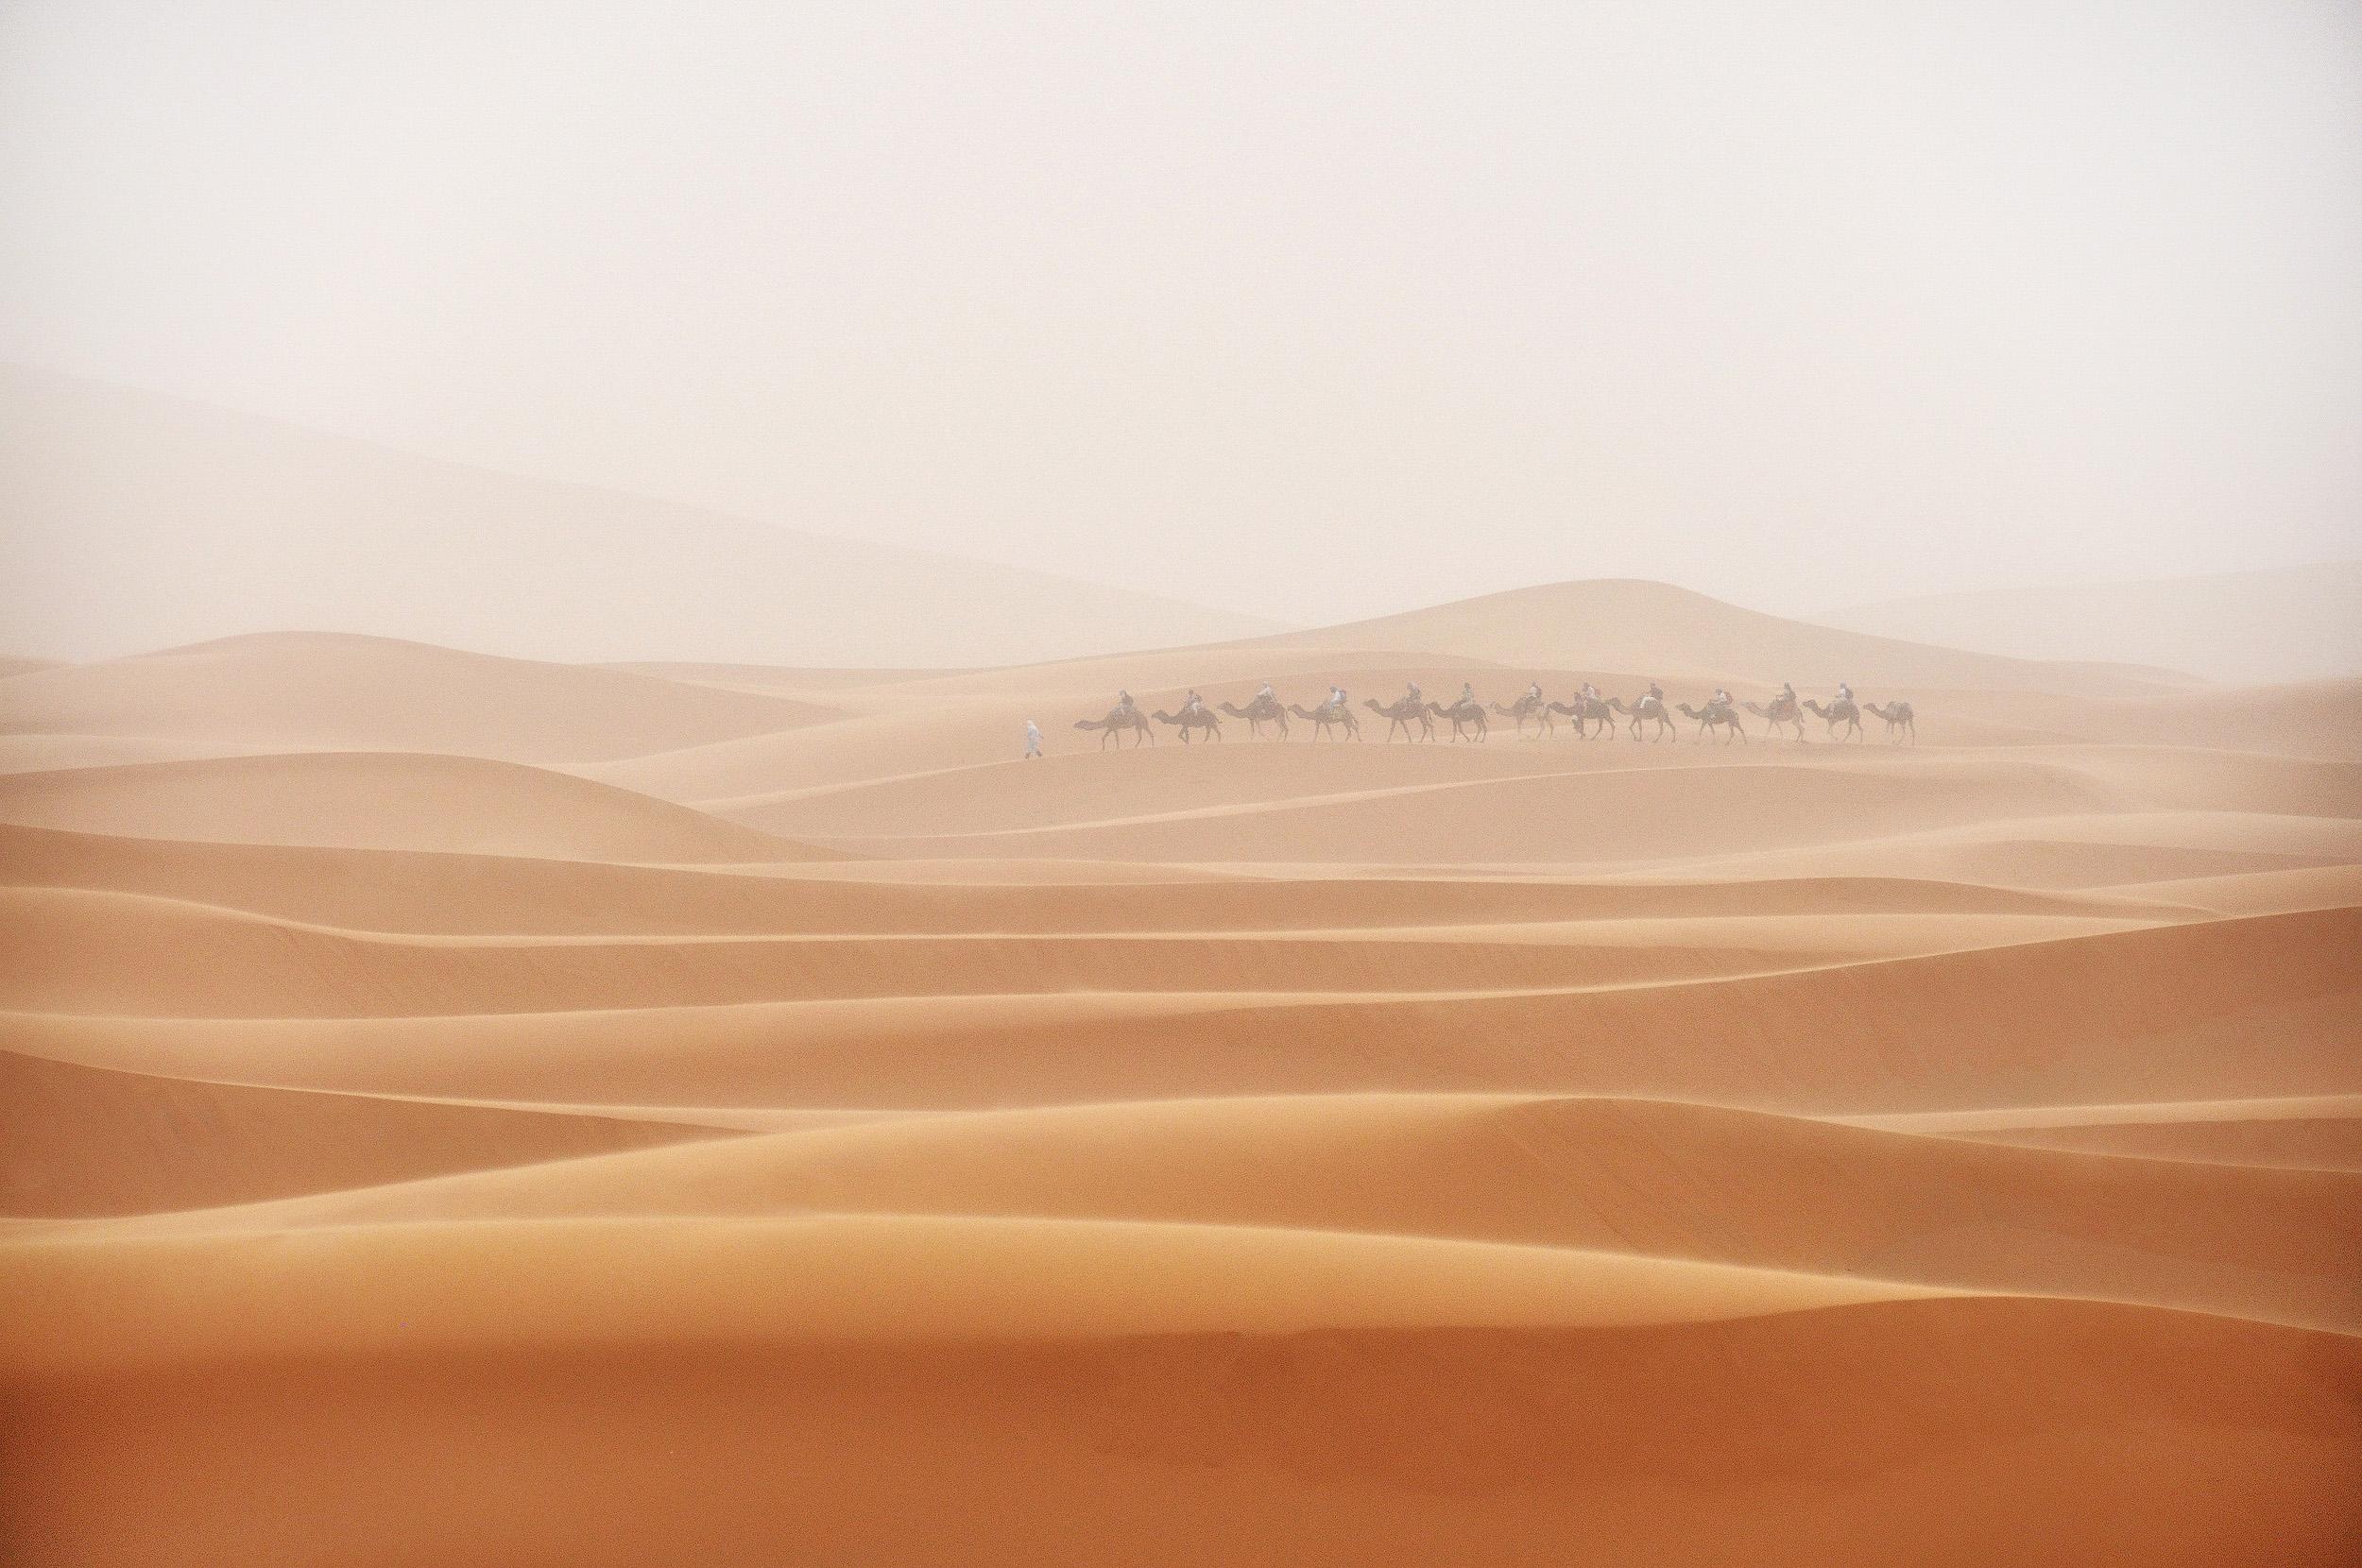 Camel Train   A camel train rides through a sandstorm in the Sahara desert, Morocco